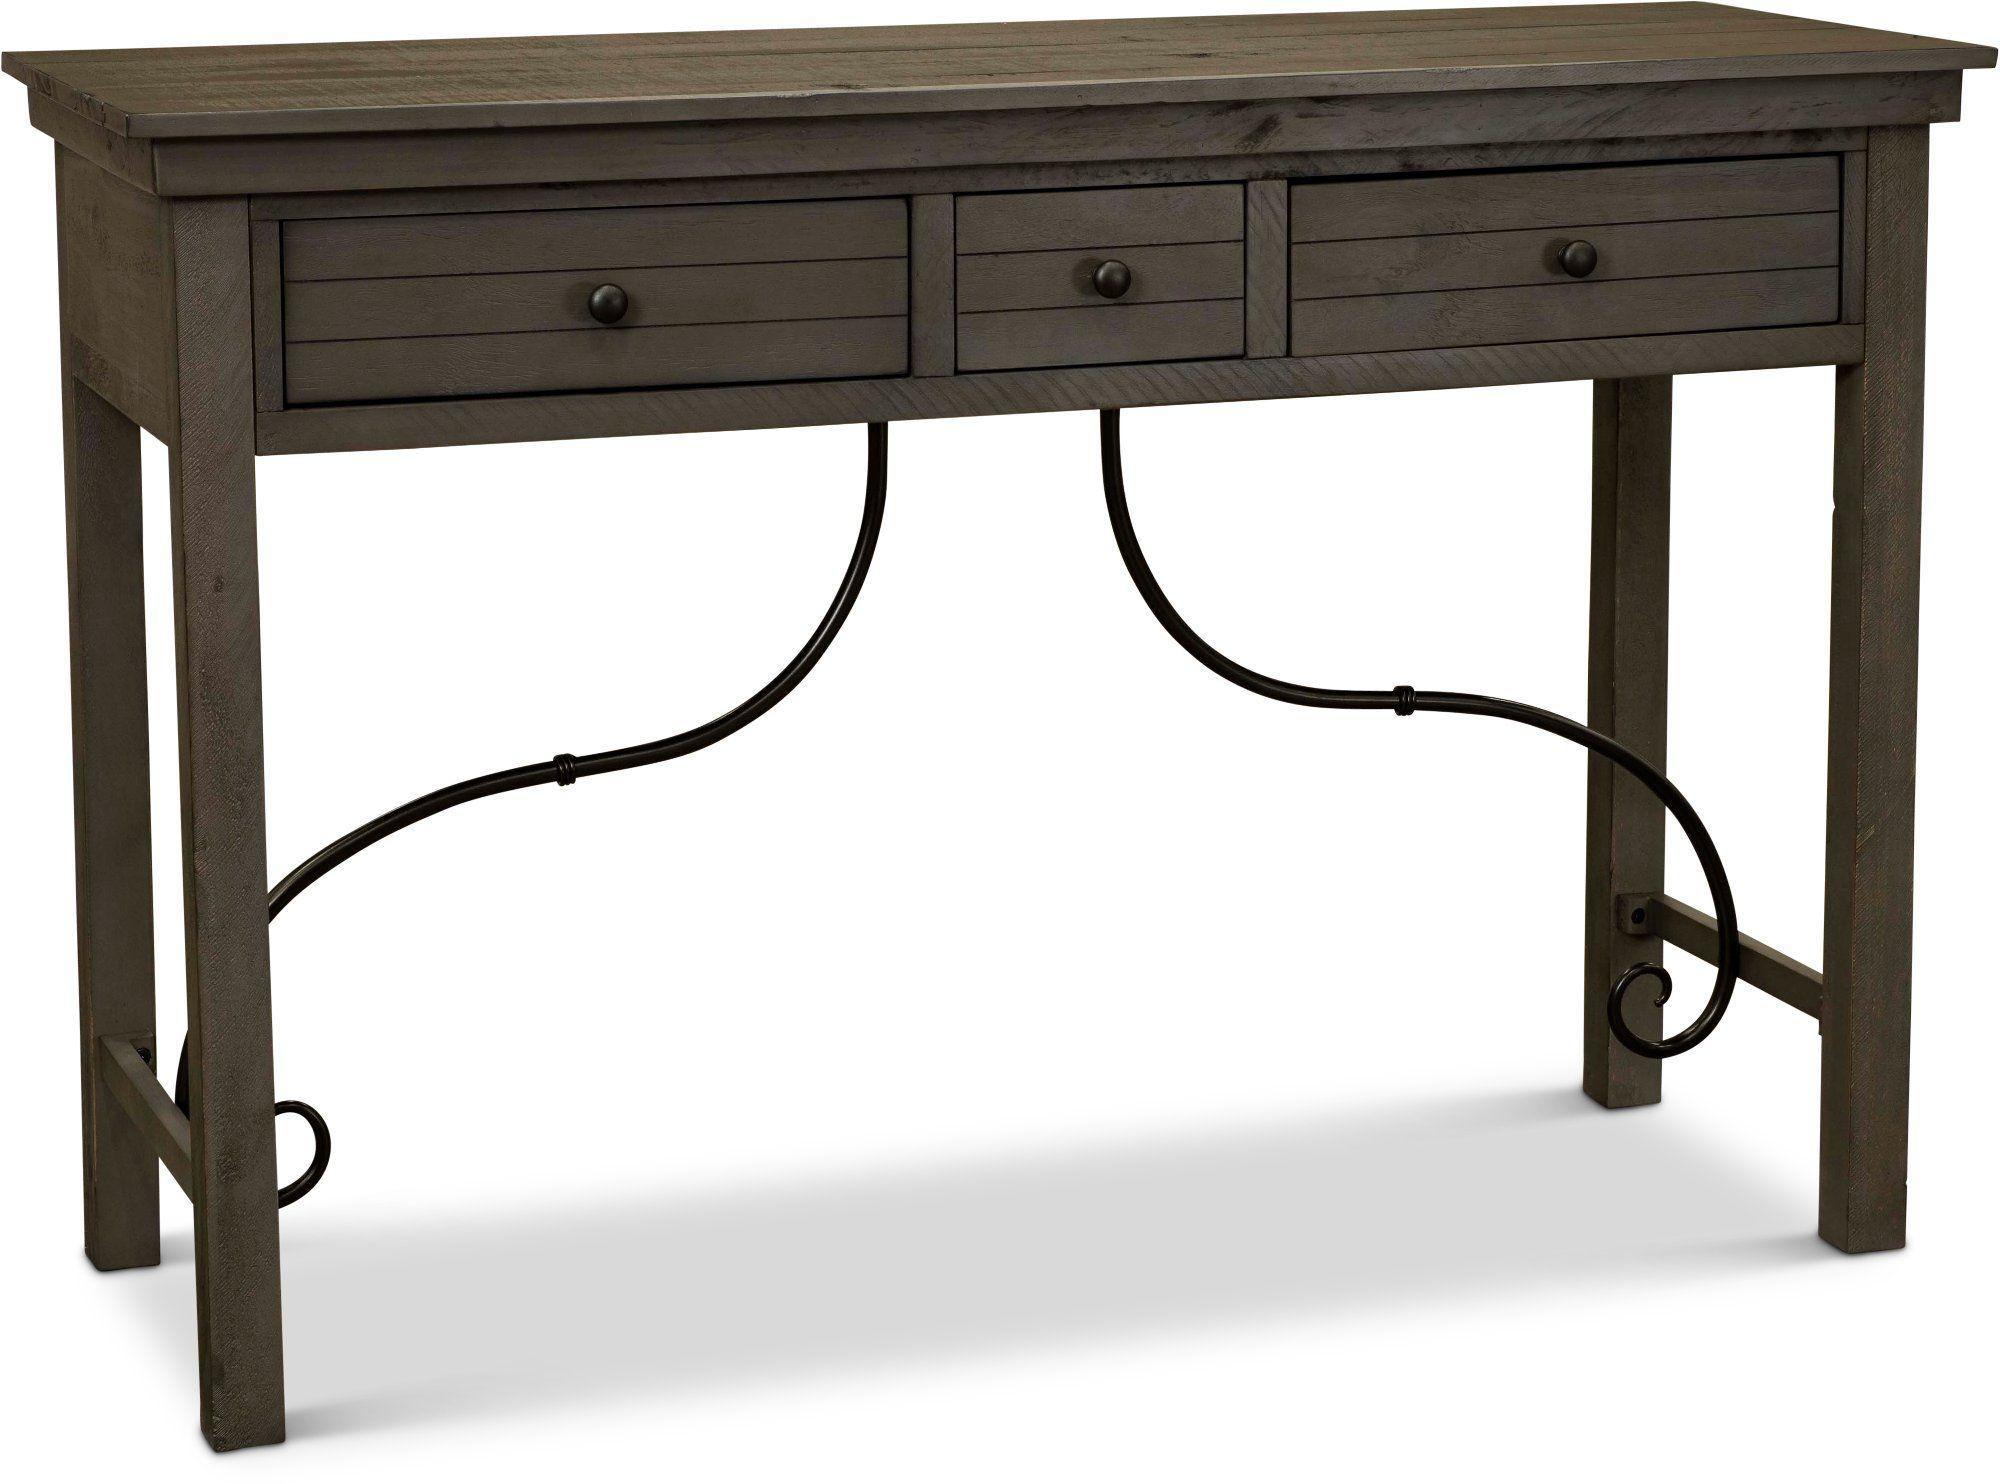 Distressed Gray Sofa Table San Miniato Rustic Sofa Tables